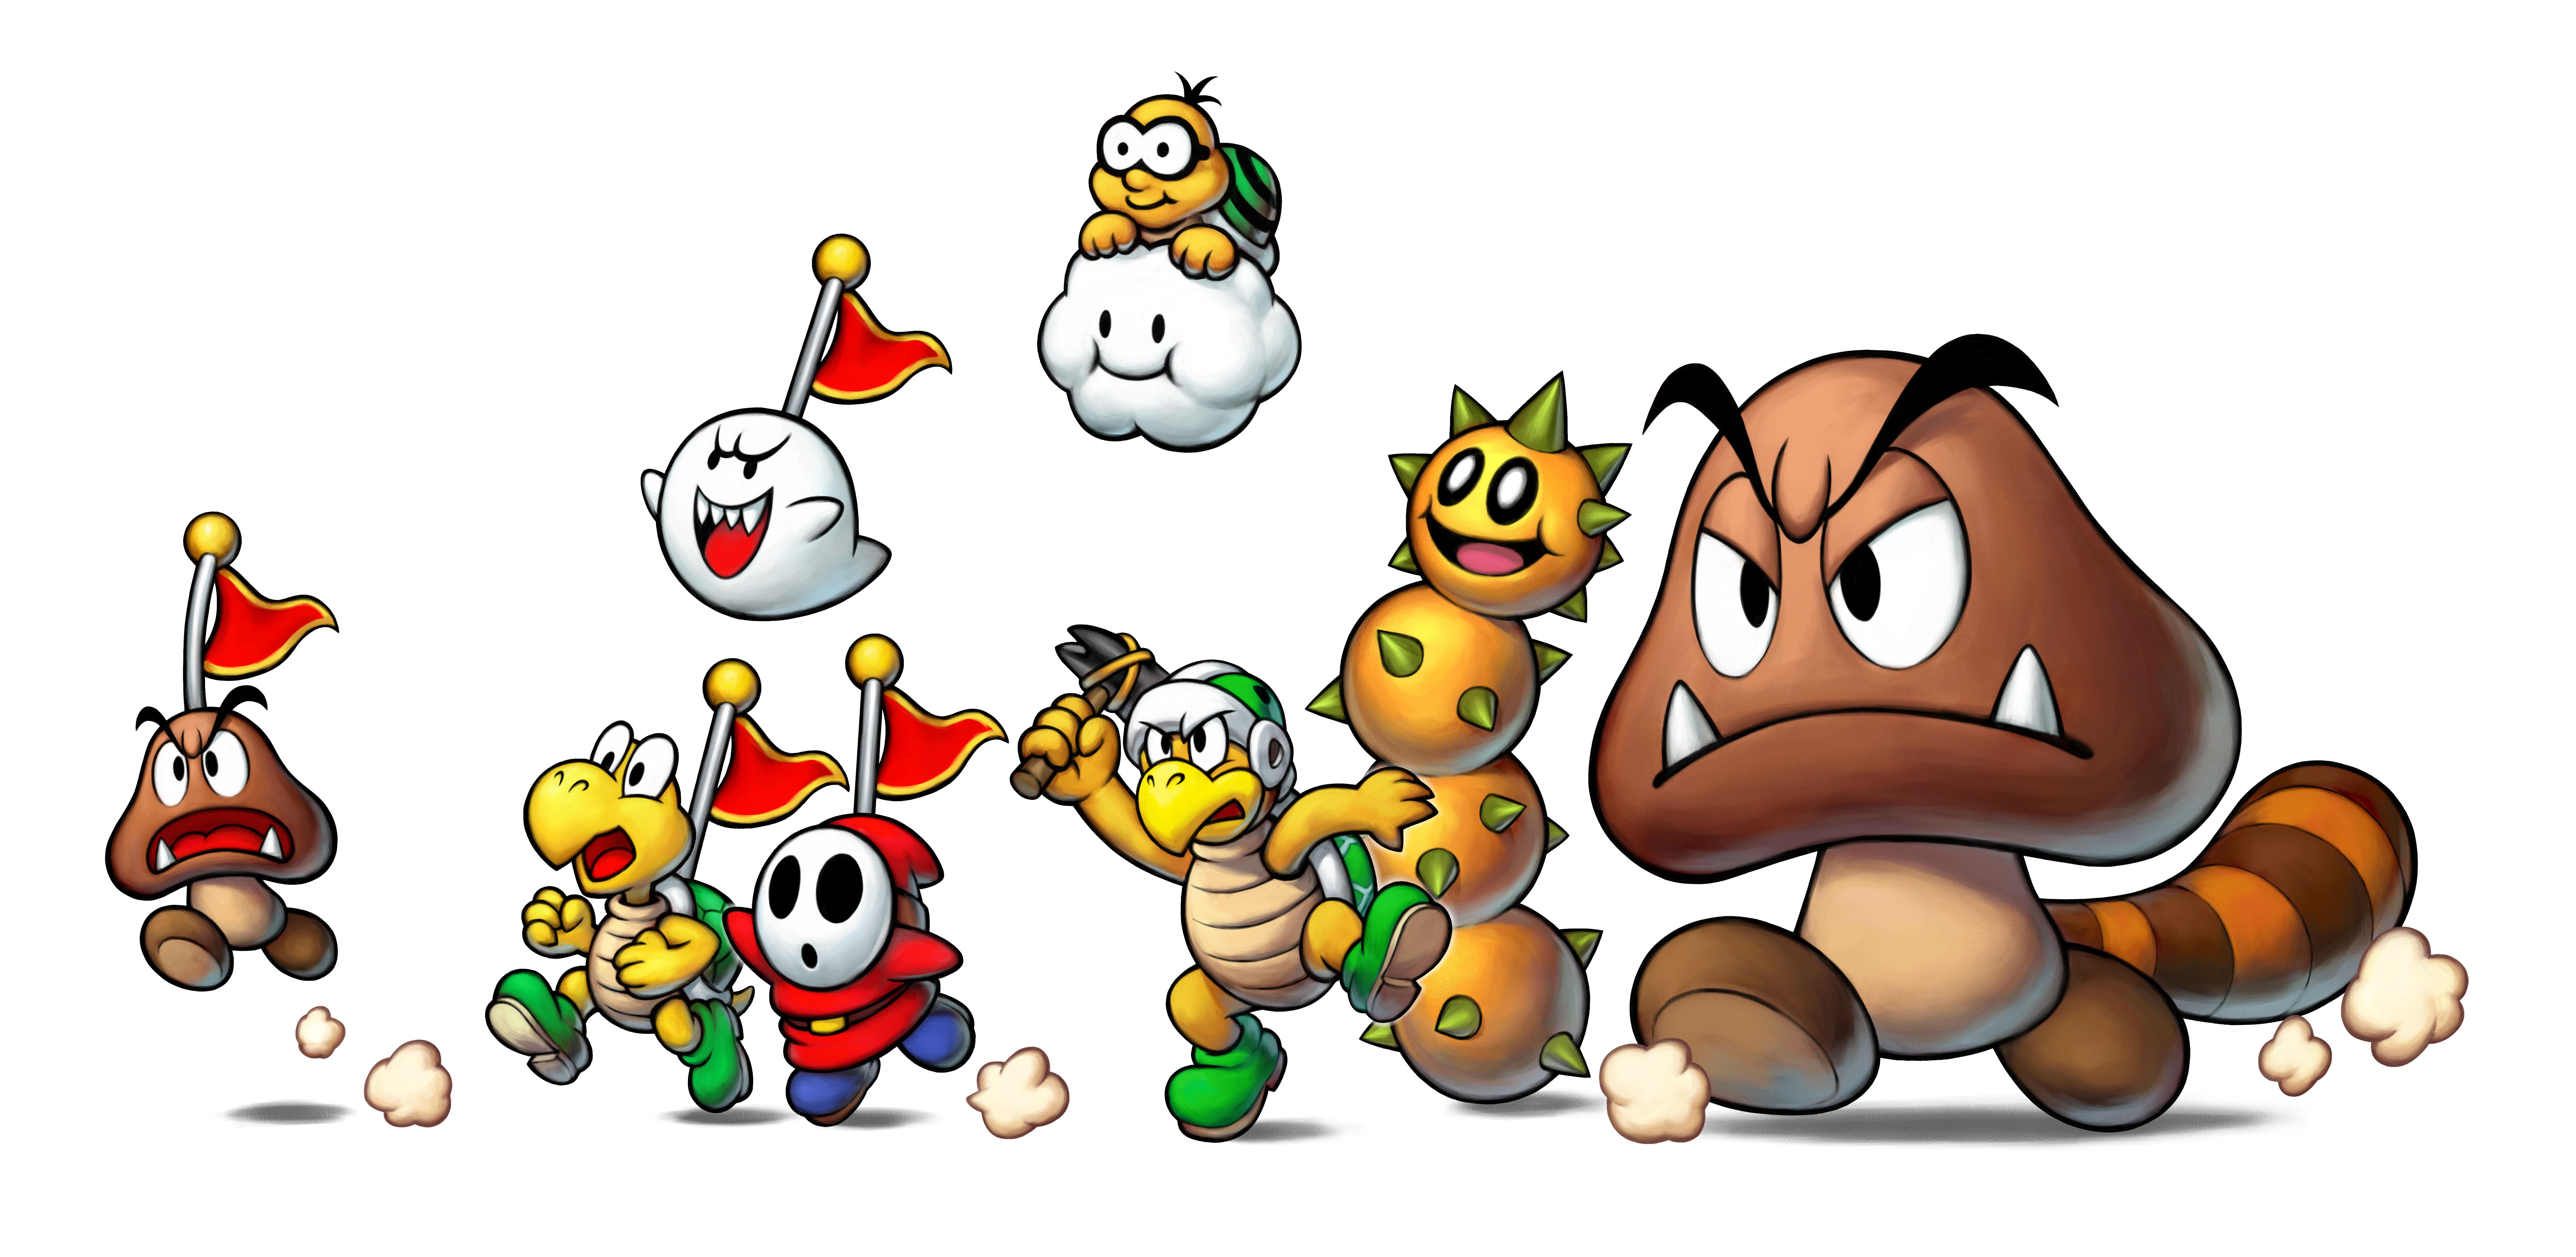 Mario Luigi Superstar Saga Bowser S Minions Doesn T Feature